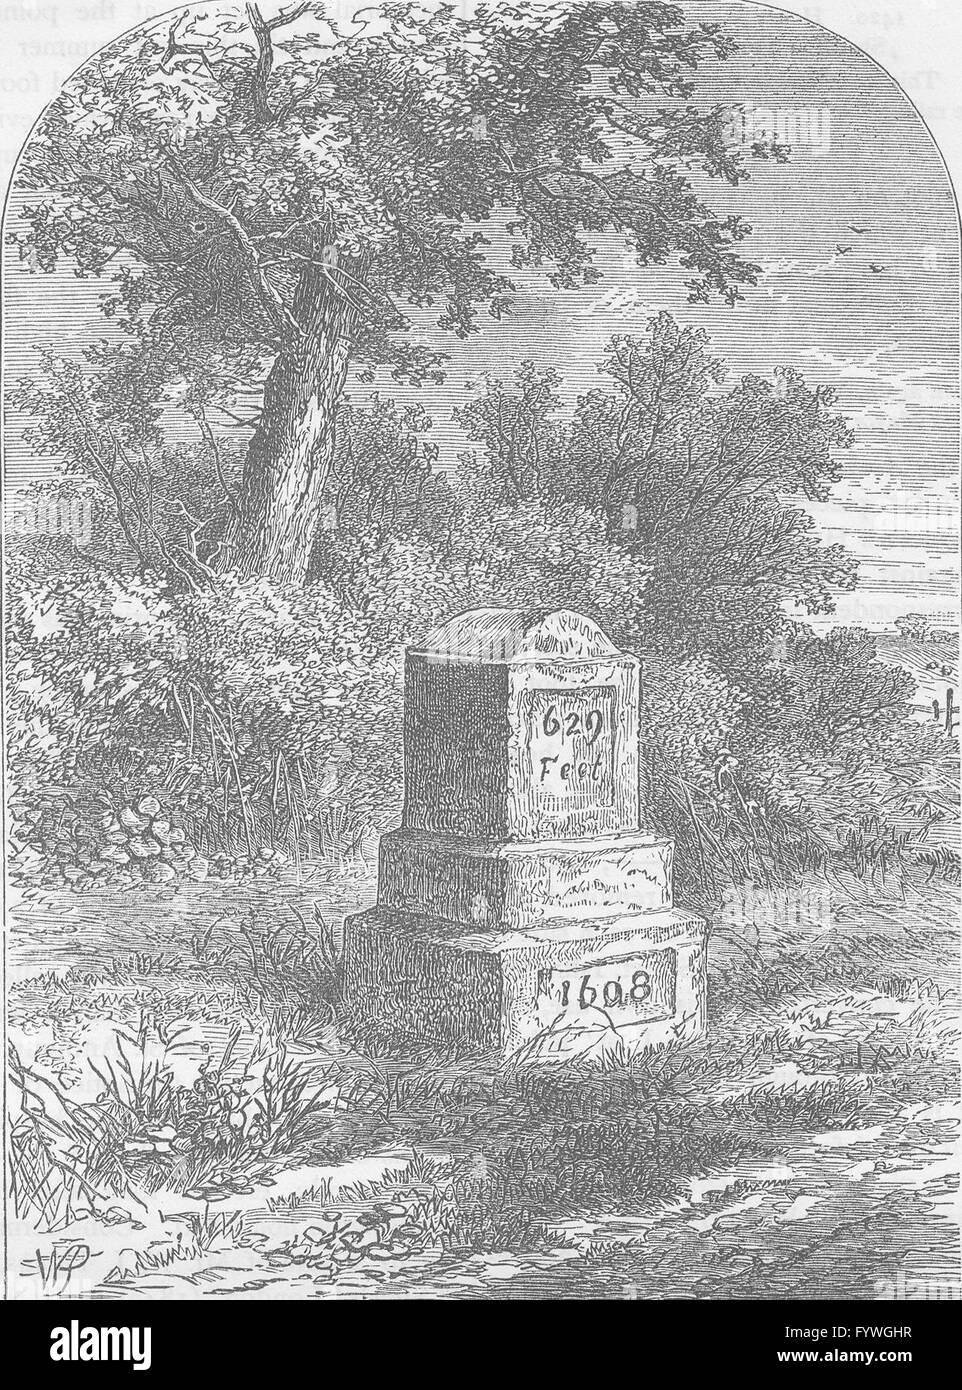 HOLLOWAY: Whittington's stone in 1820. London, antique print c1880 - Stock Image